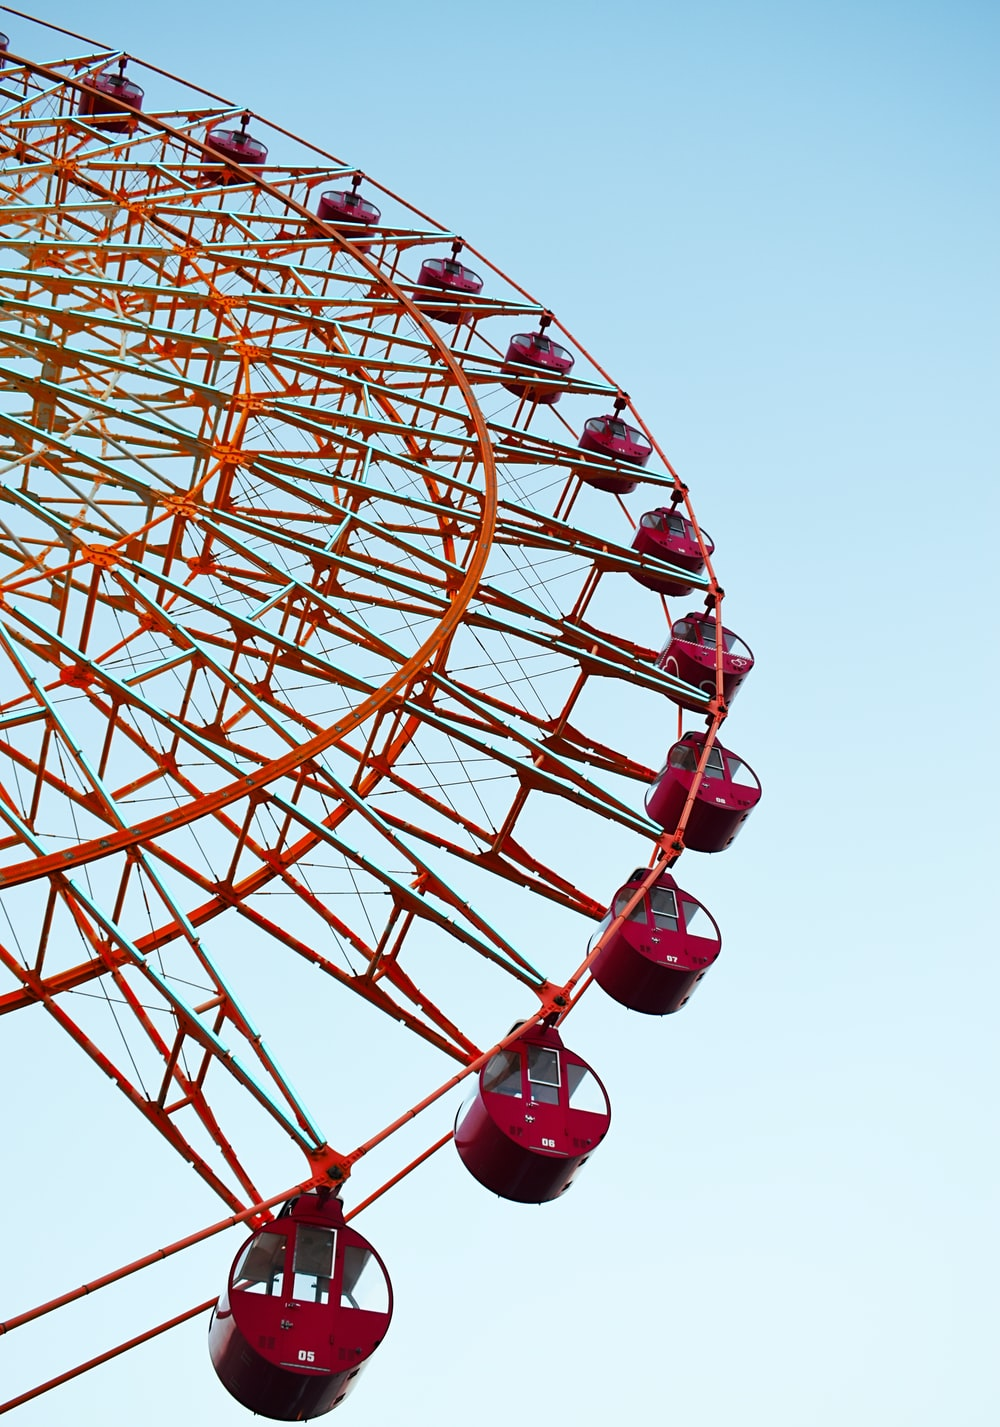 red ferry's wheel